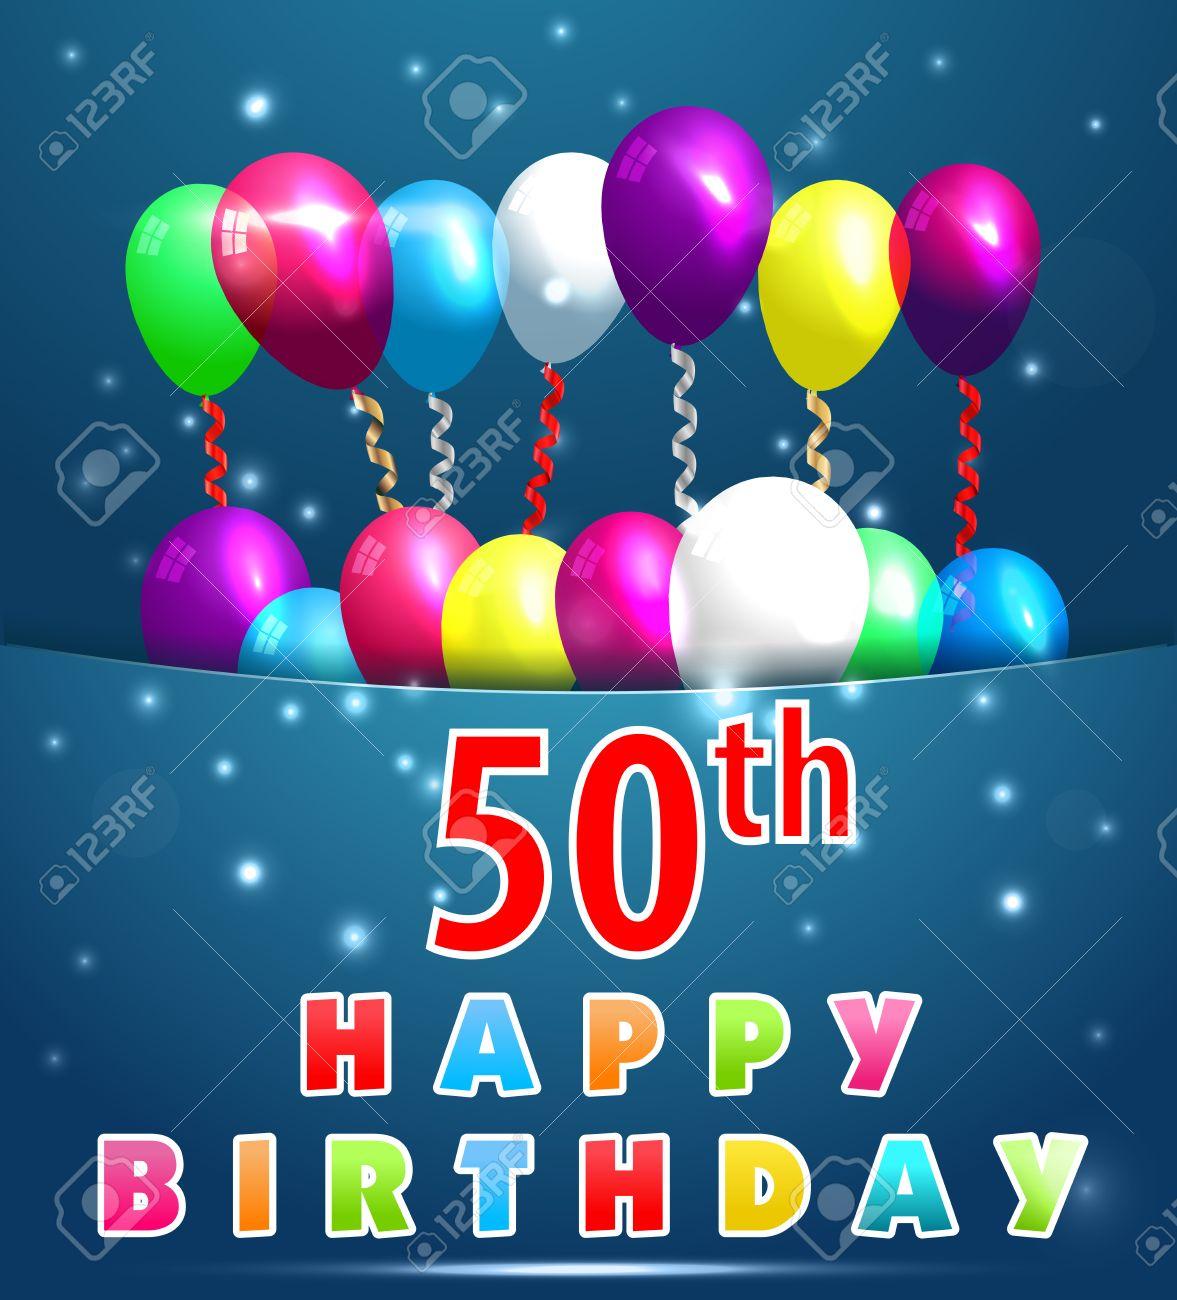 50 Geburtstag Karte.Stock Photo